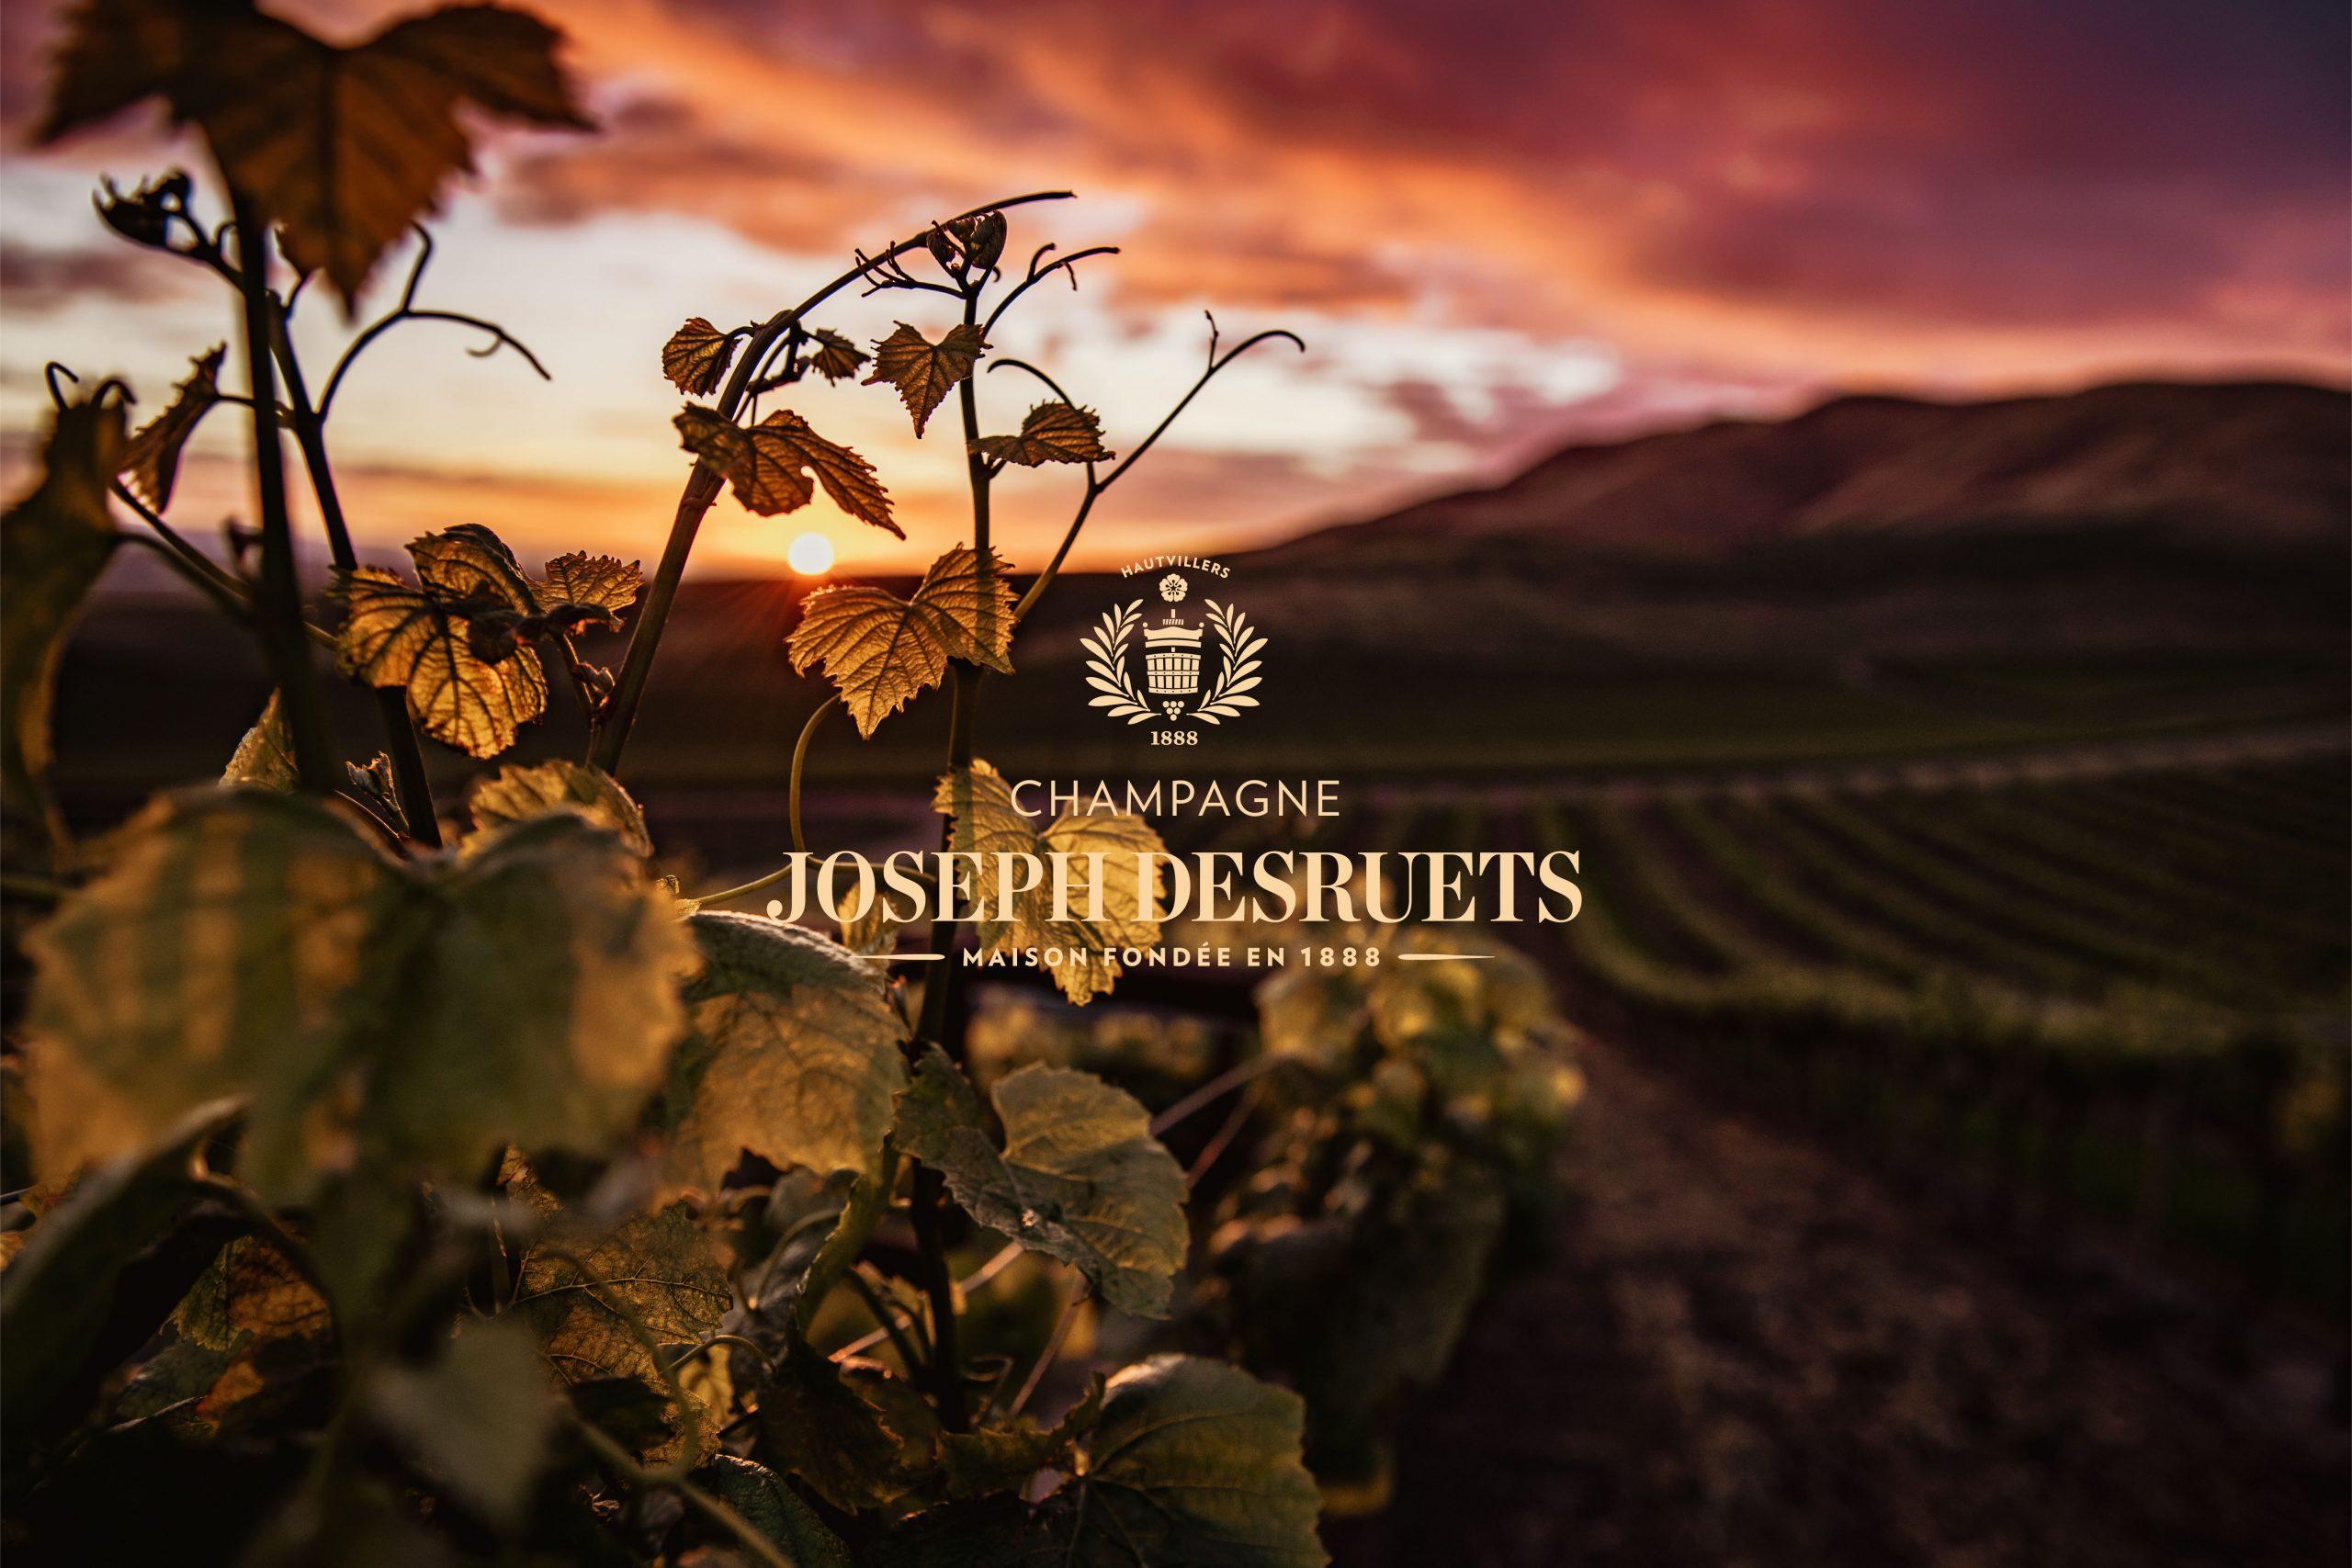 Champagne Joseph Desruets